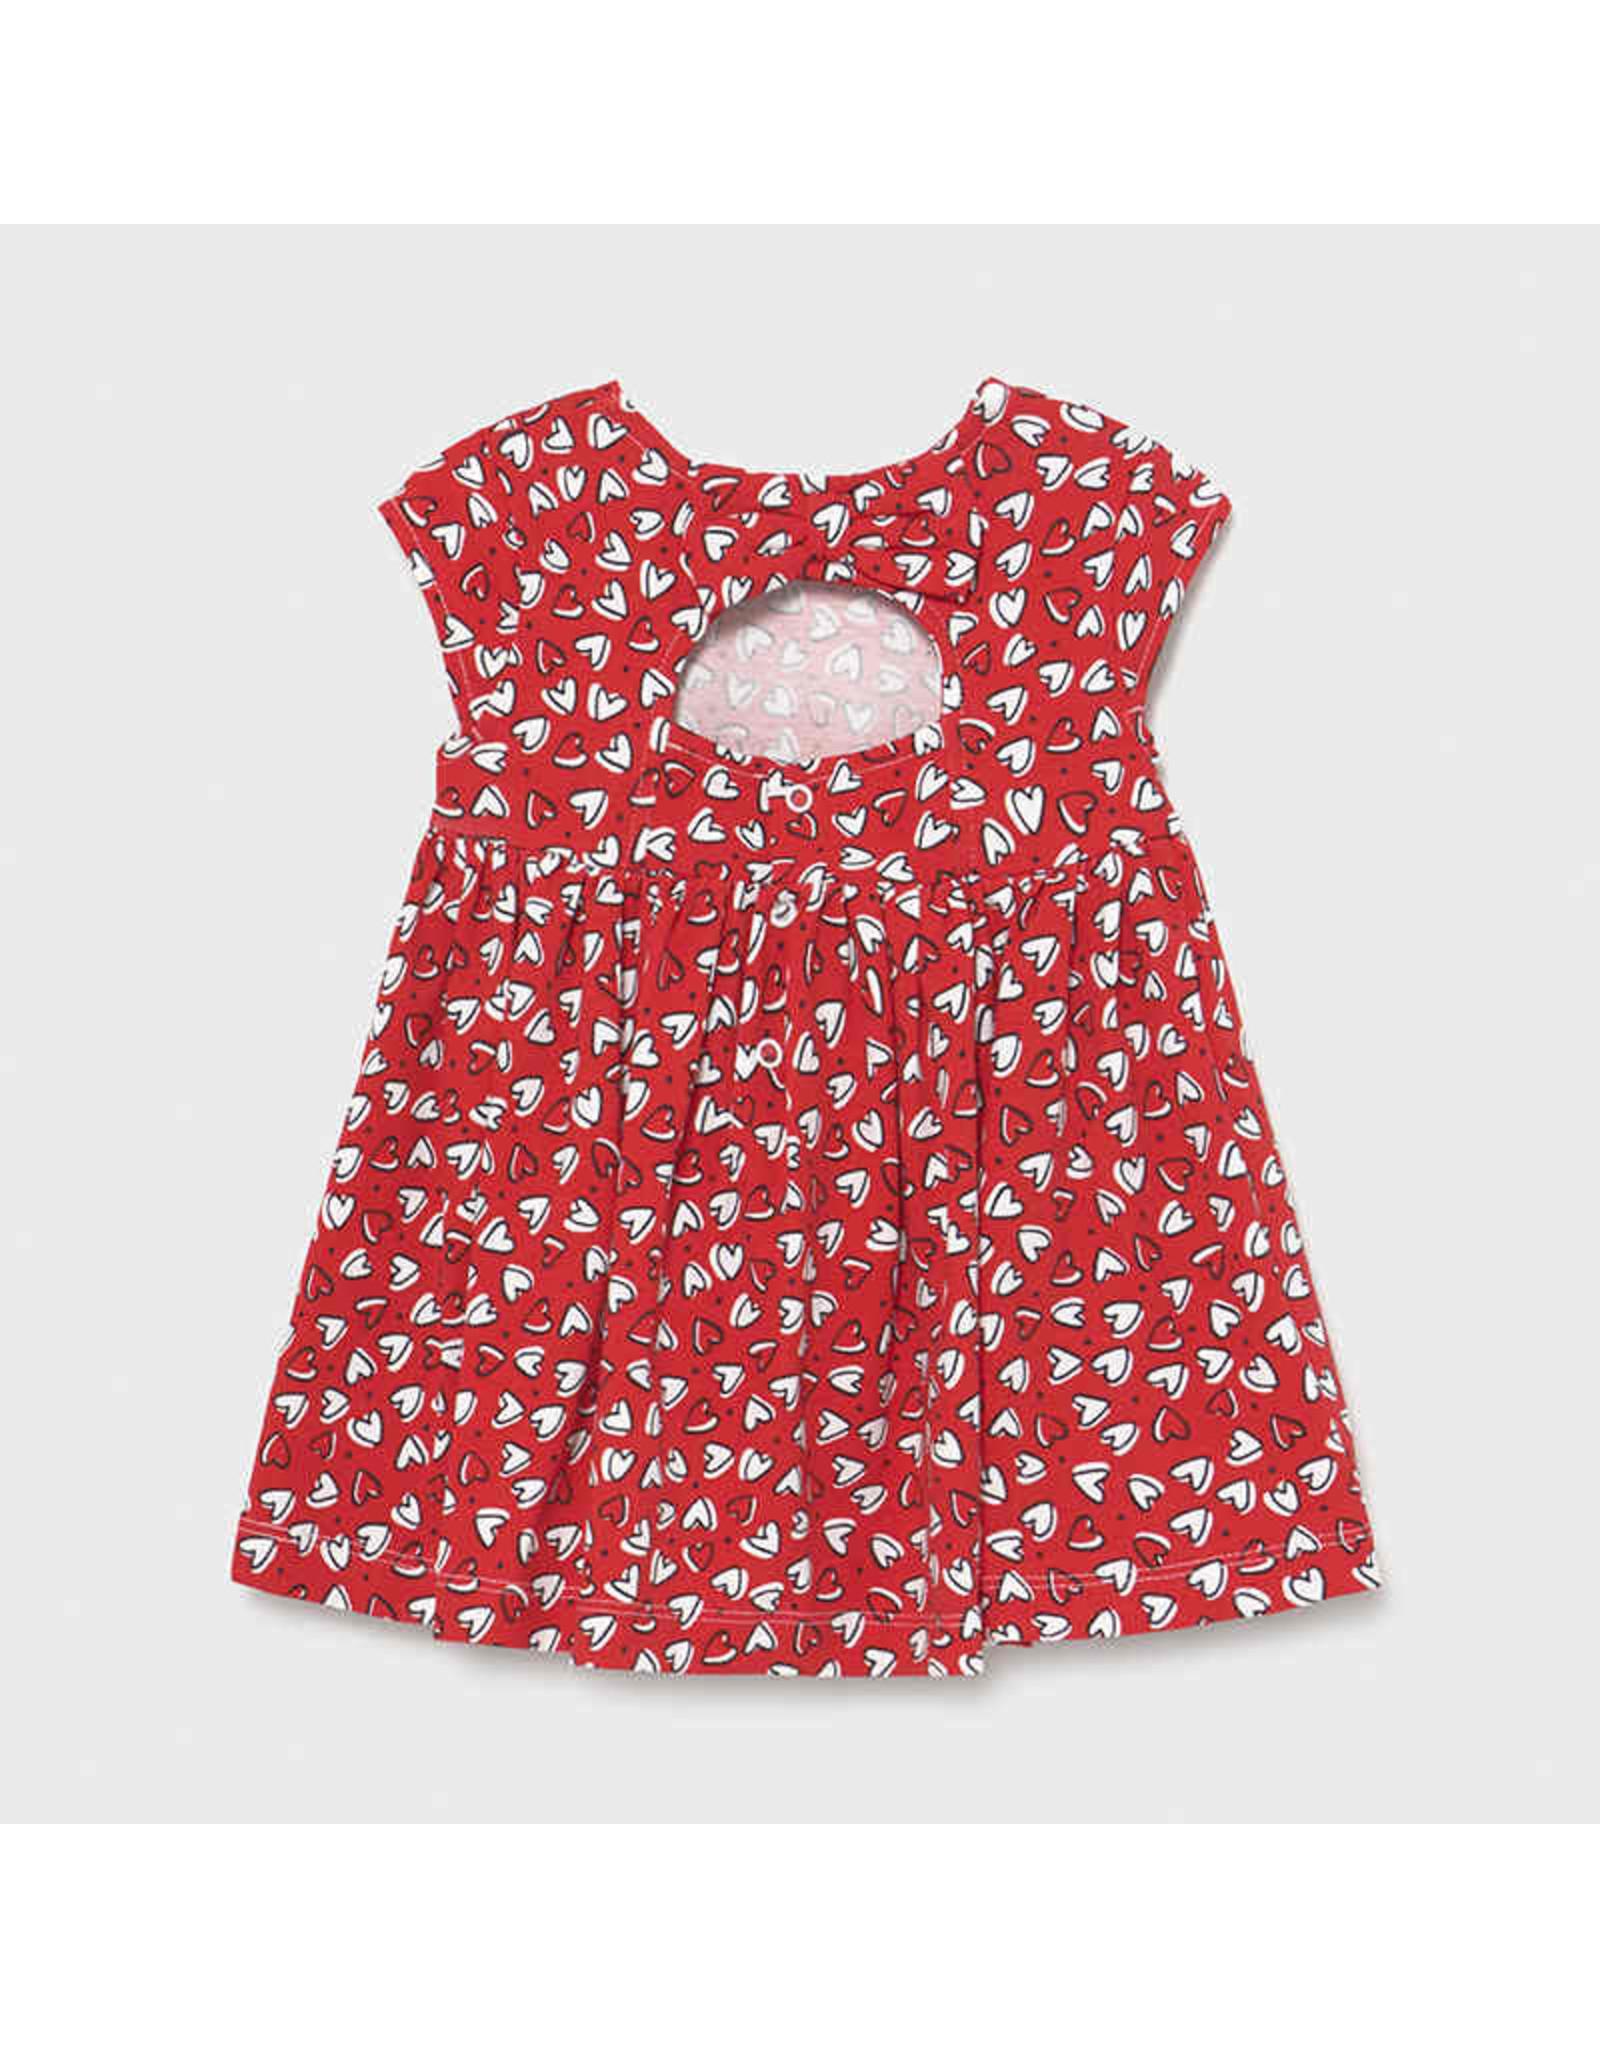 Mayoral Poppy Flower dress